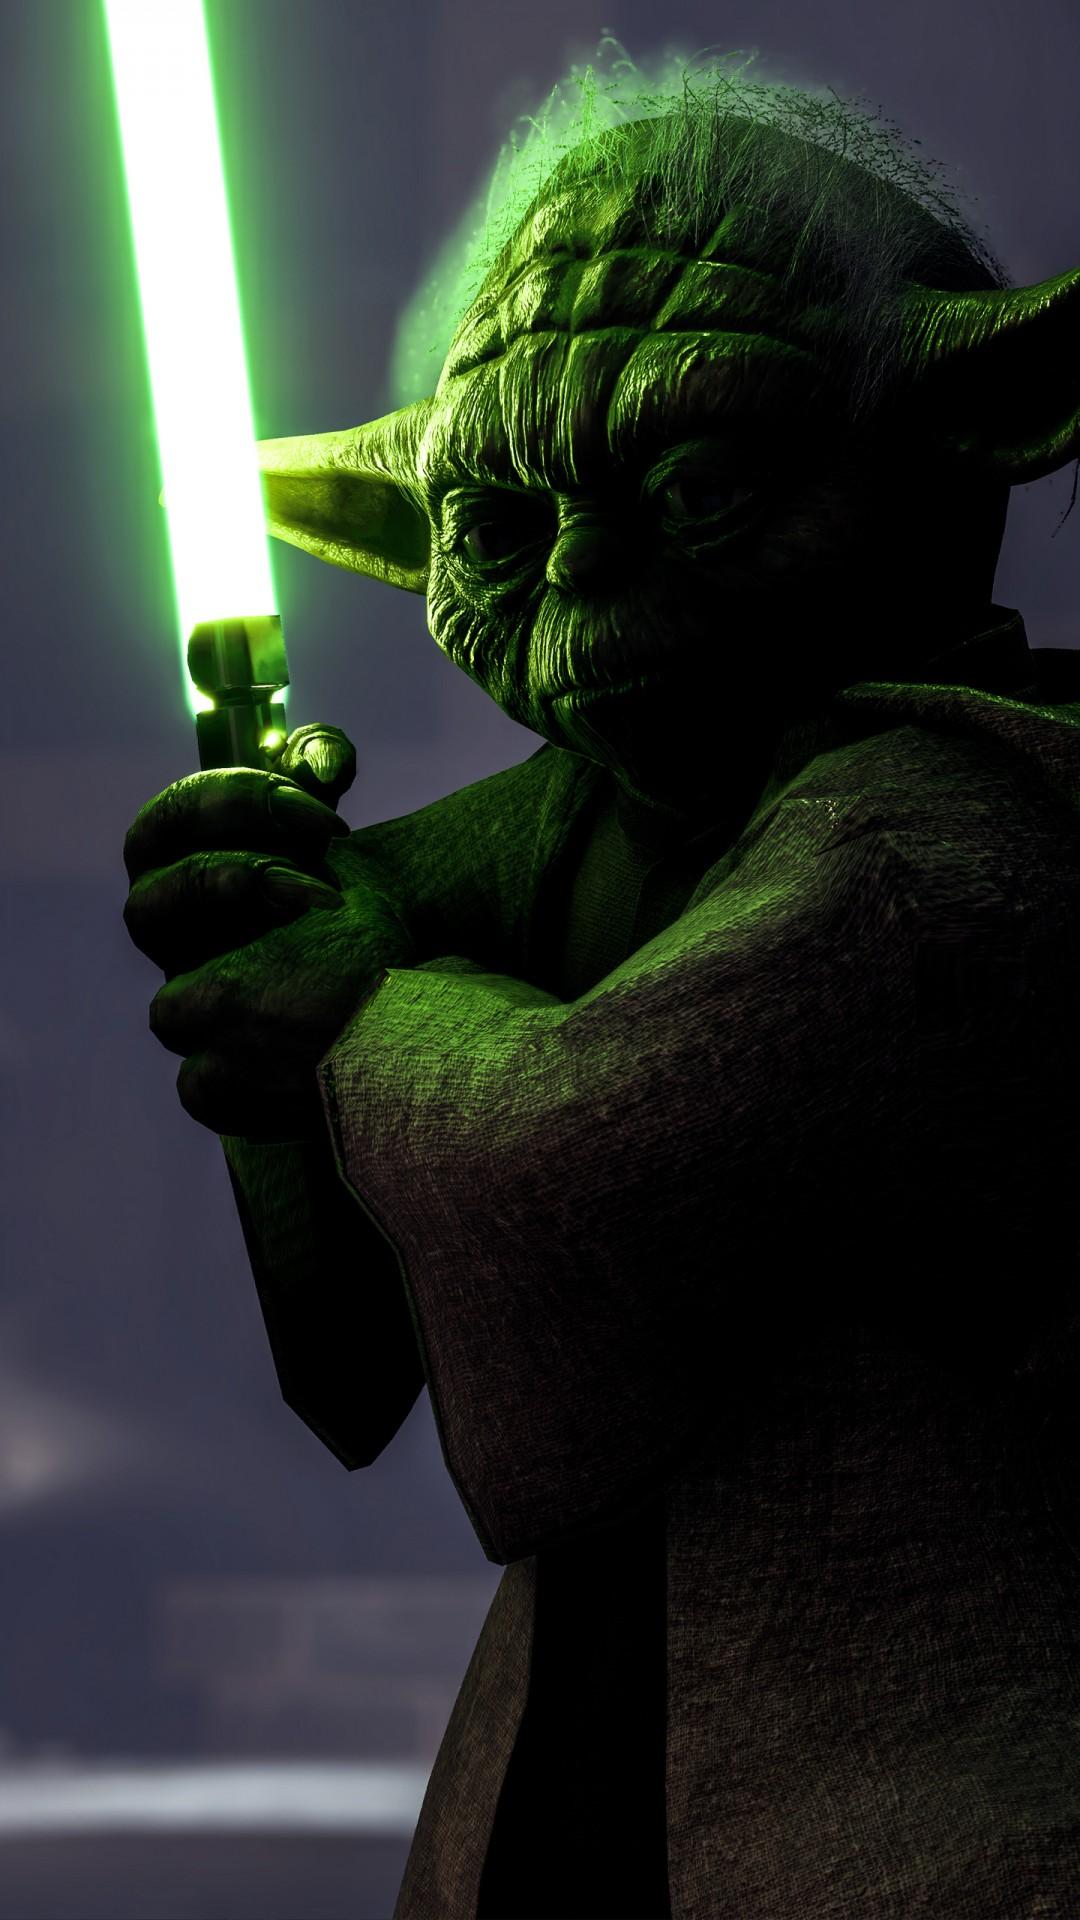 Iphone X Star Wars Wallpaper Yoda In Star Wars Battlefront 4k Wallpapers Hd